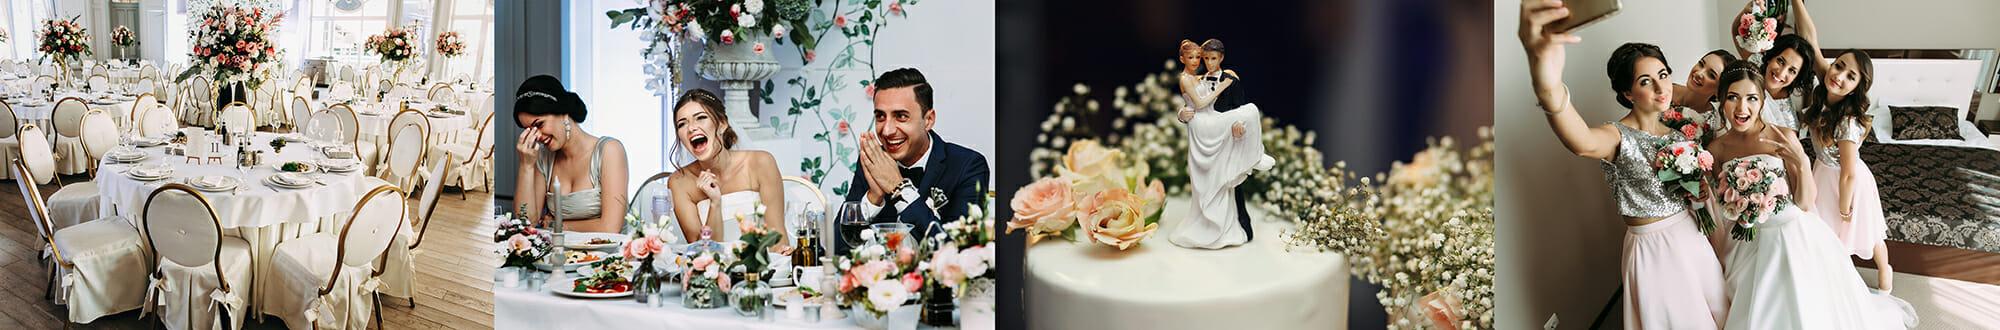 traditional wedding photography tips